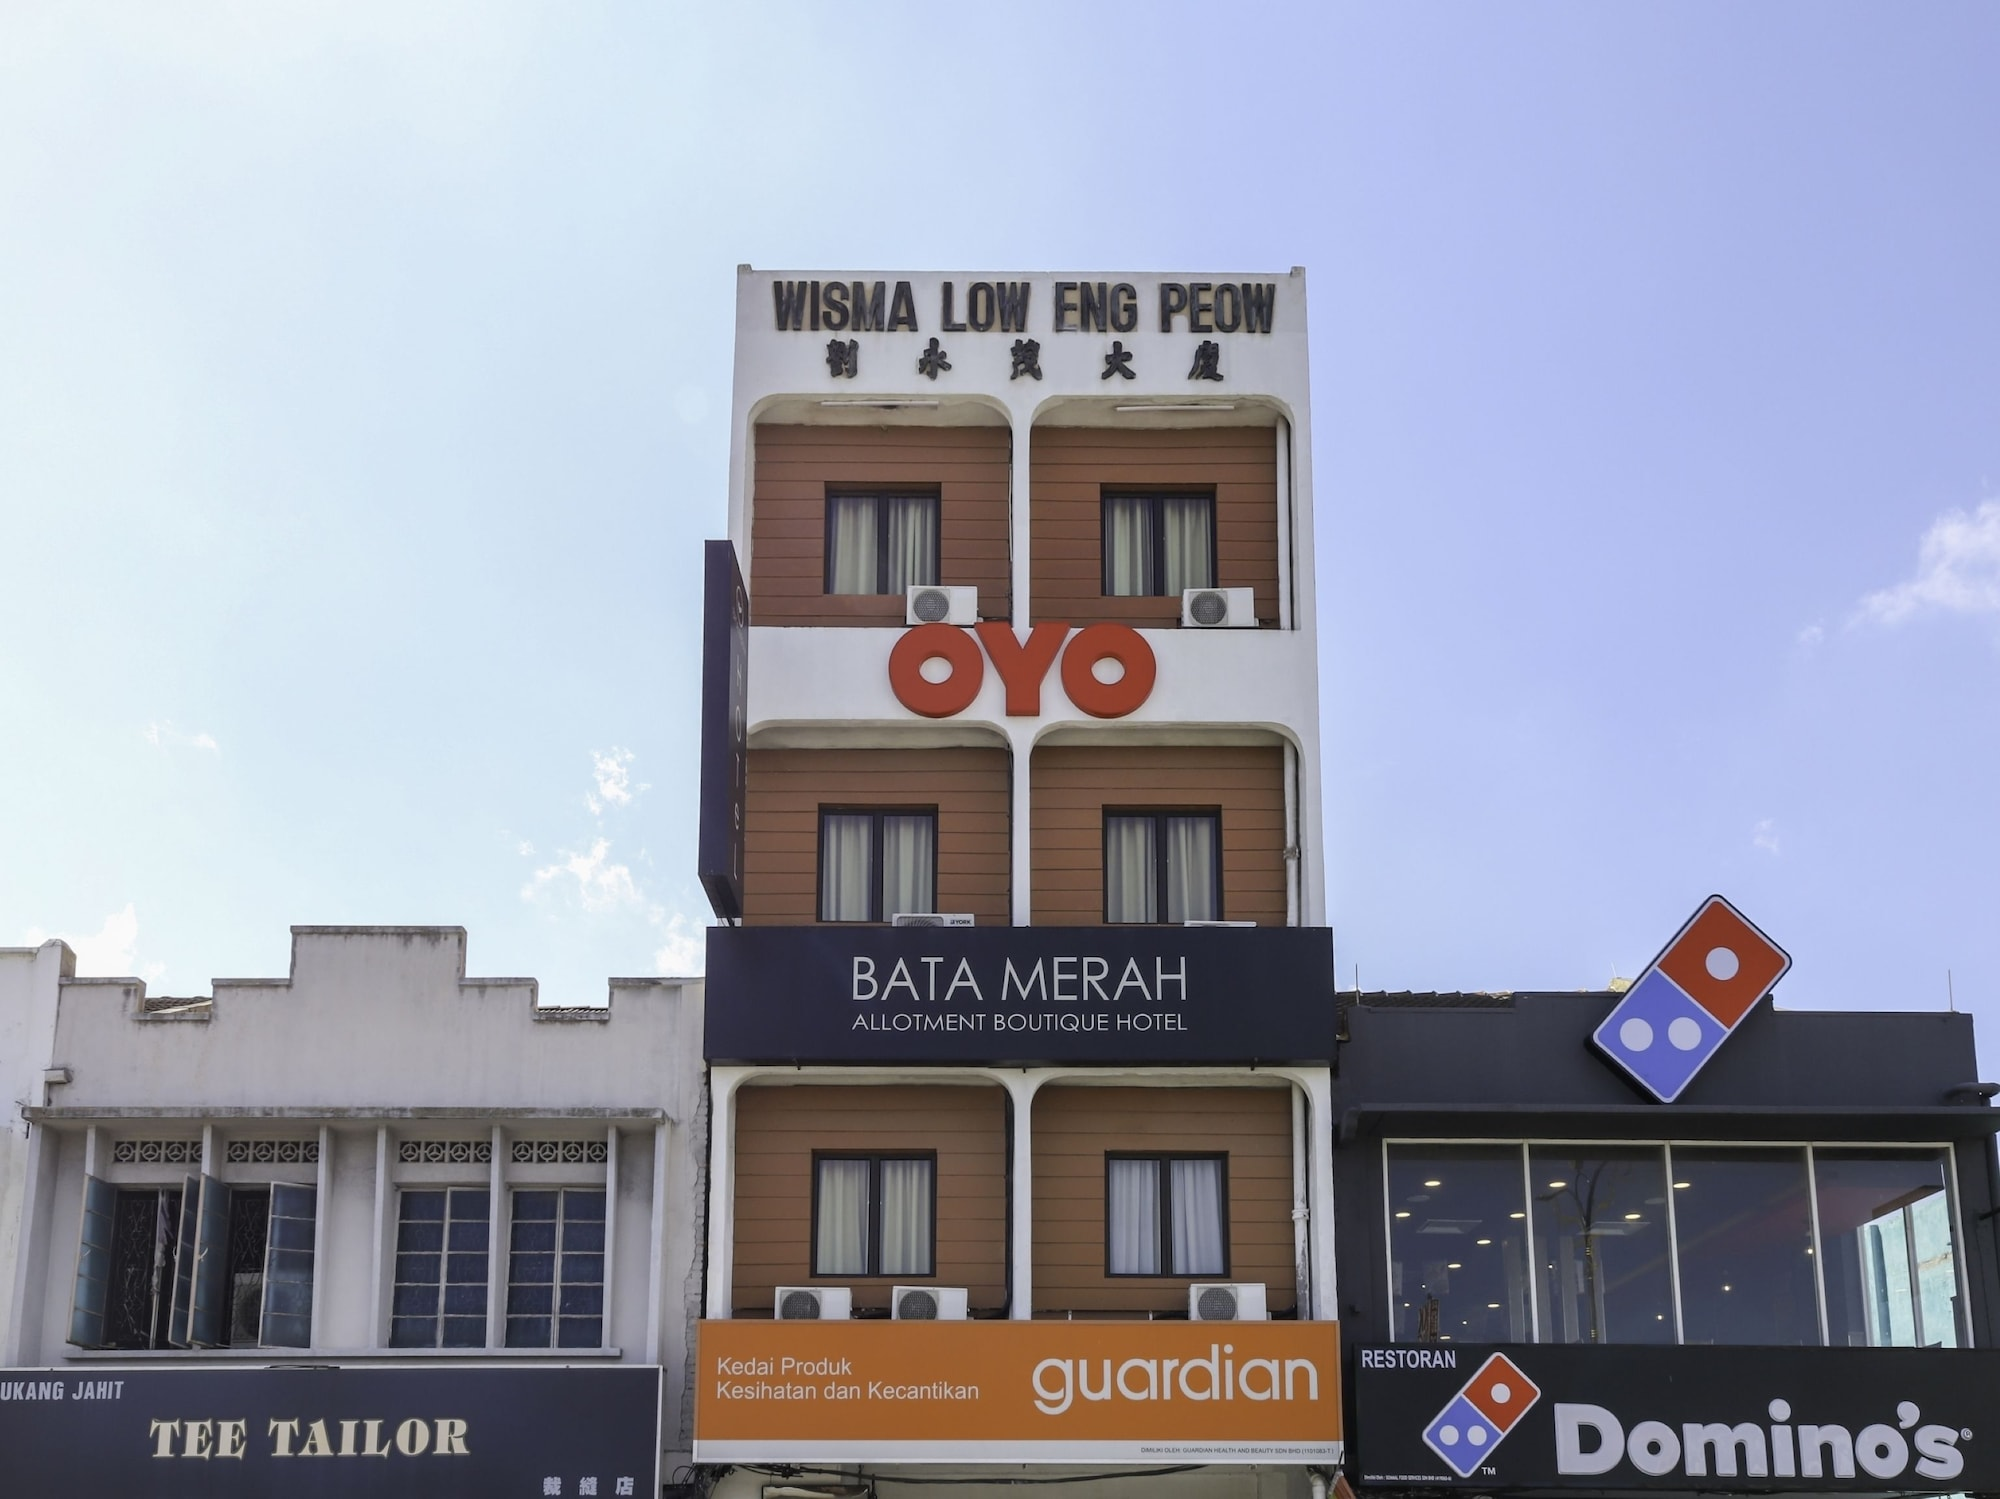 OYO 696 Bata Merah Boutique Hotel, Kuala Langat